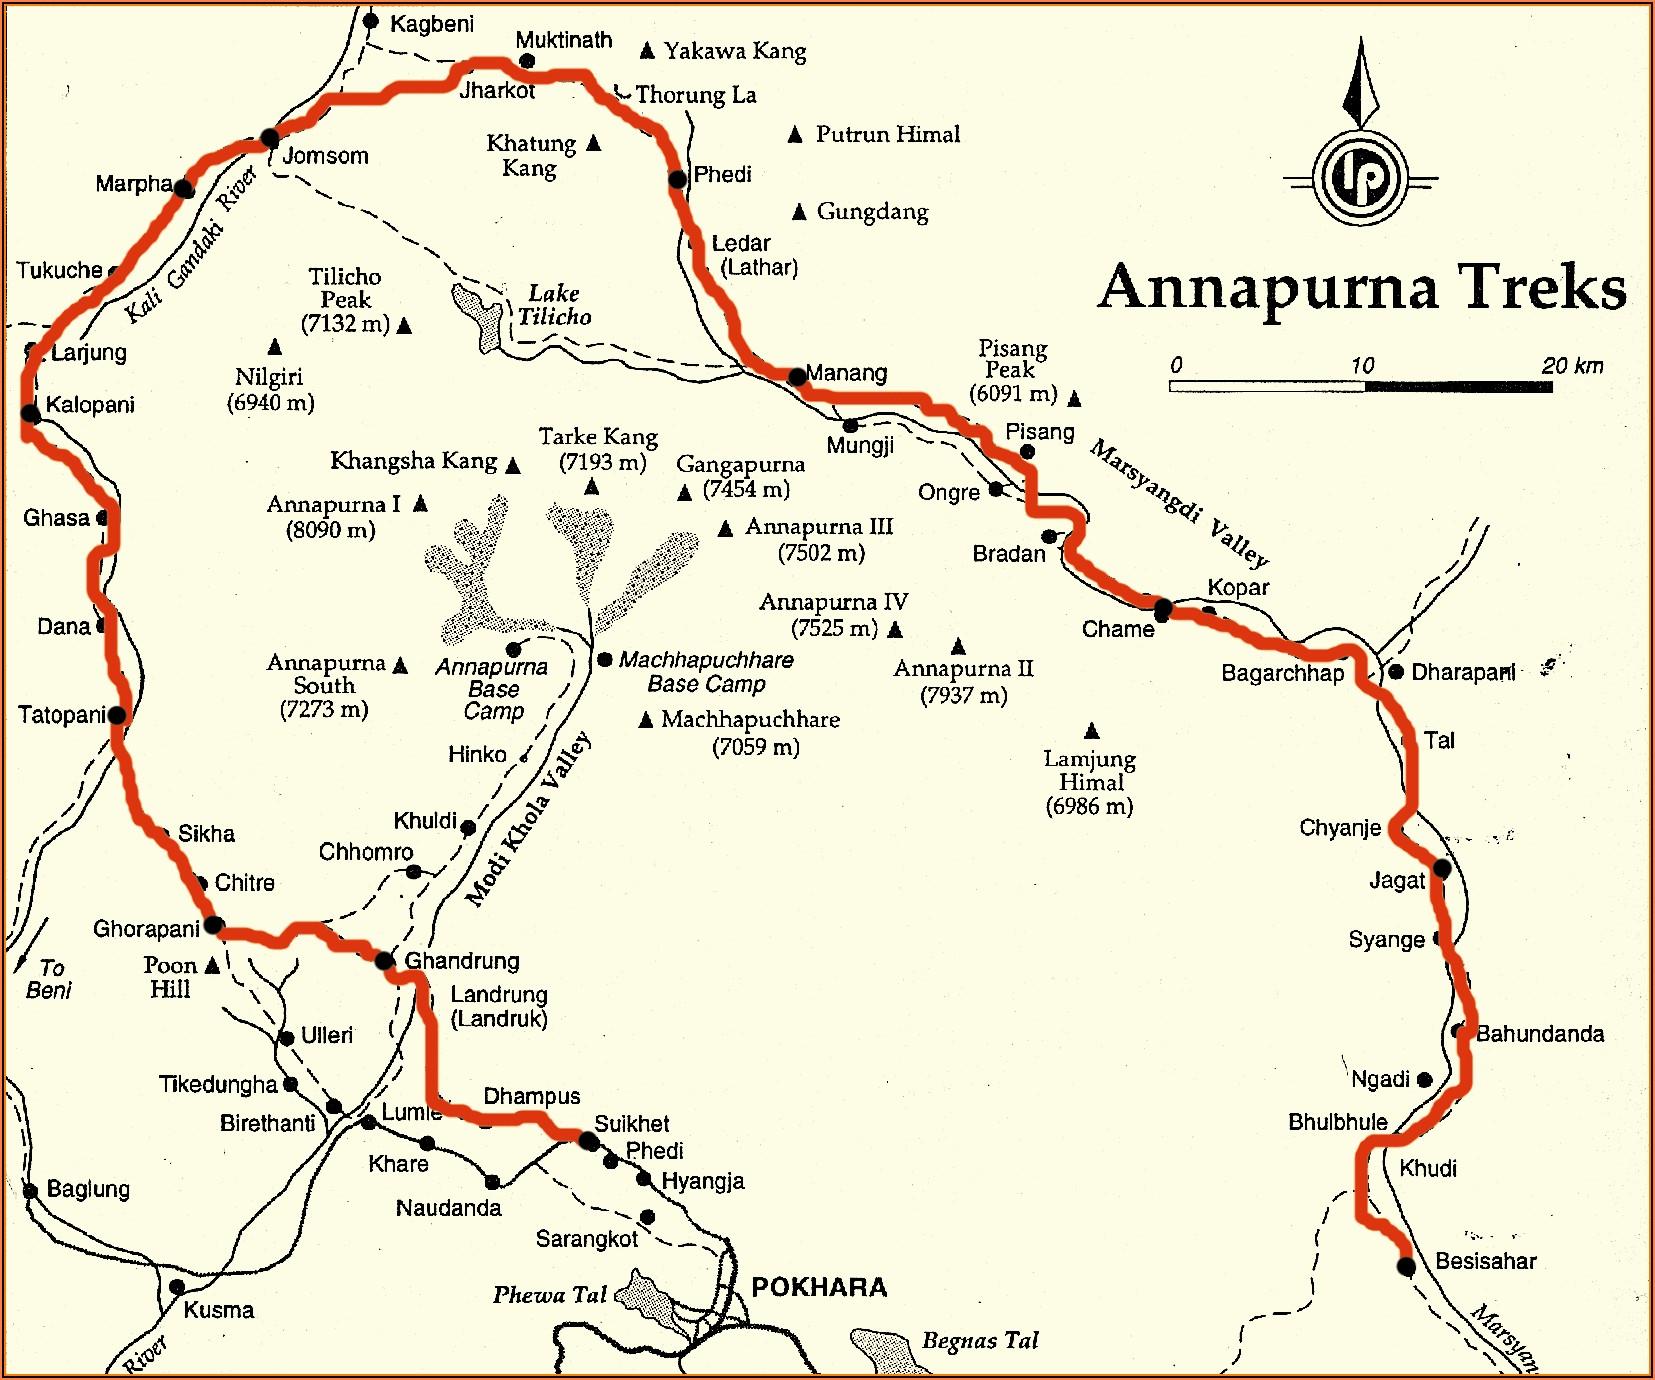 Annapurna Trek Route Map